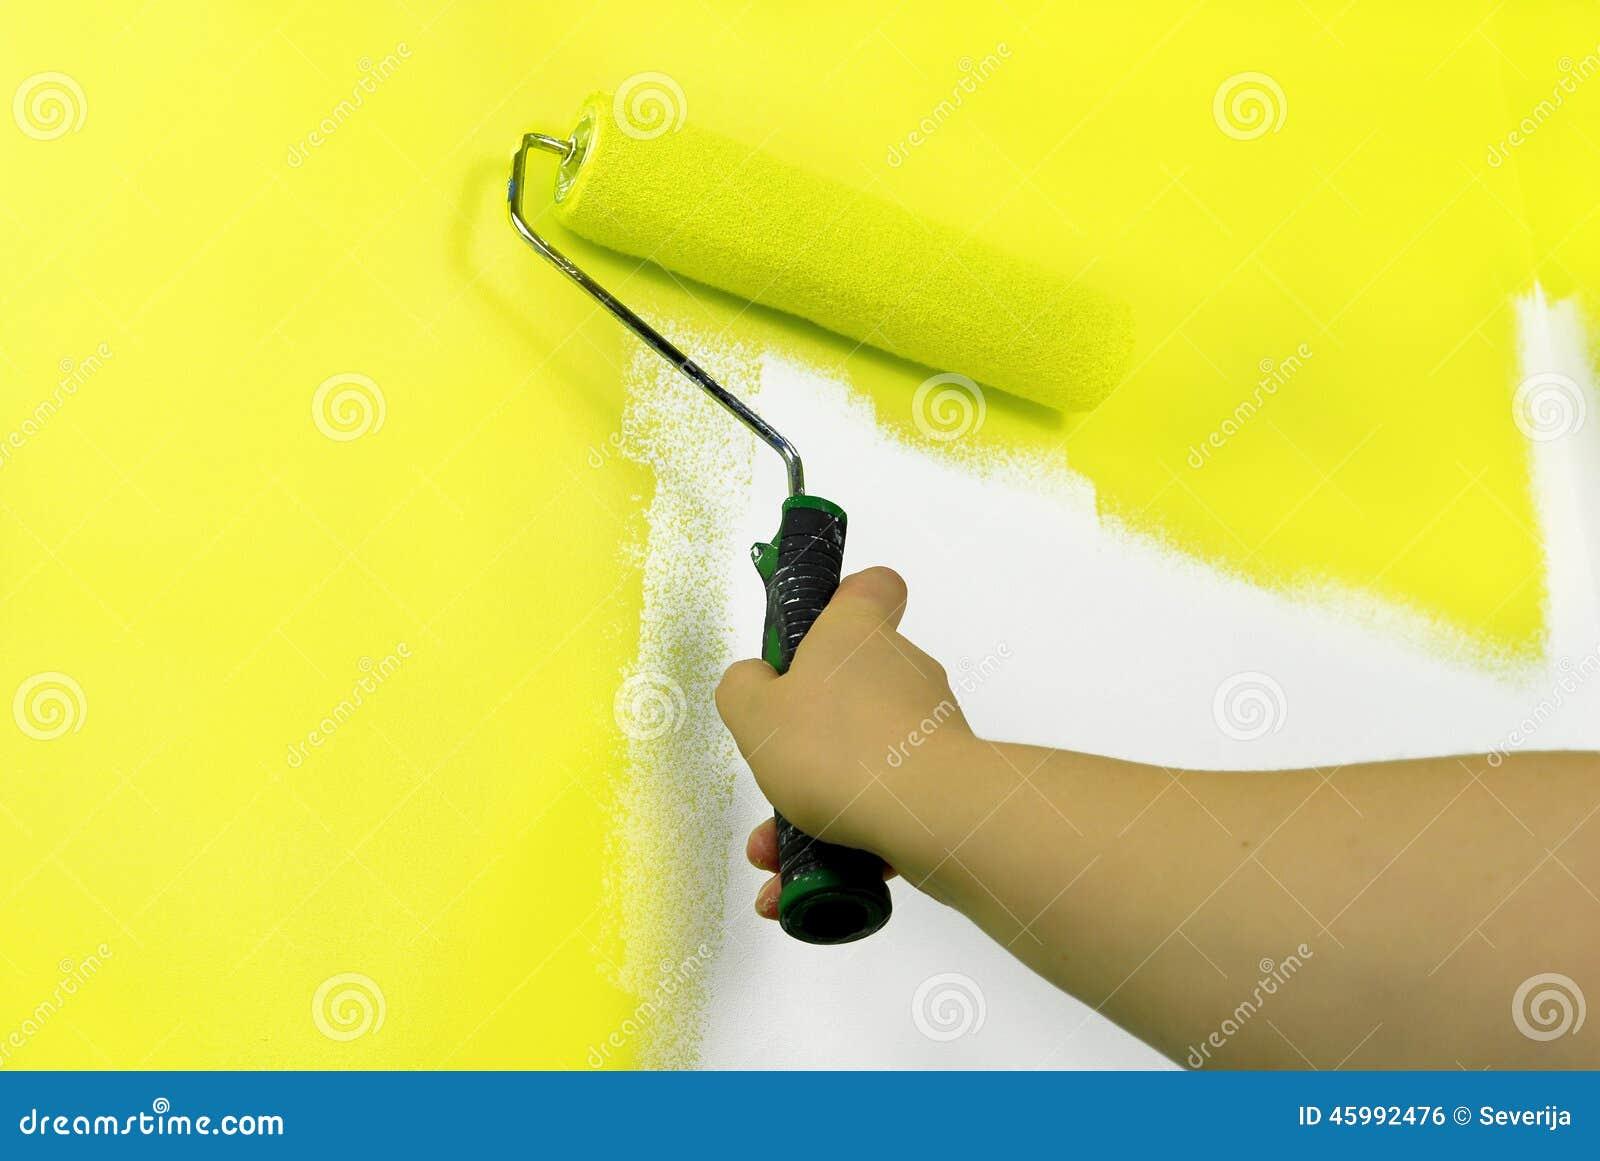 mur jaune de peinture photo stock image du fixation 45992476. Black Bedroom Furniture Sets. Home Design Ideas